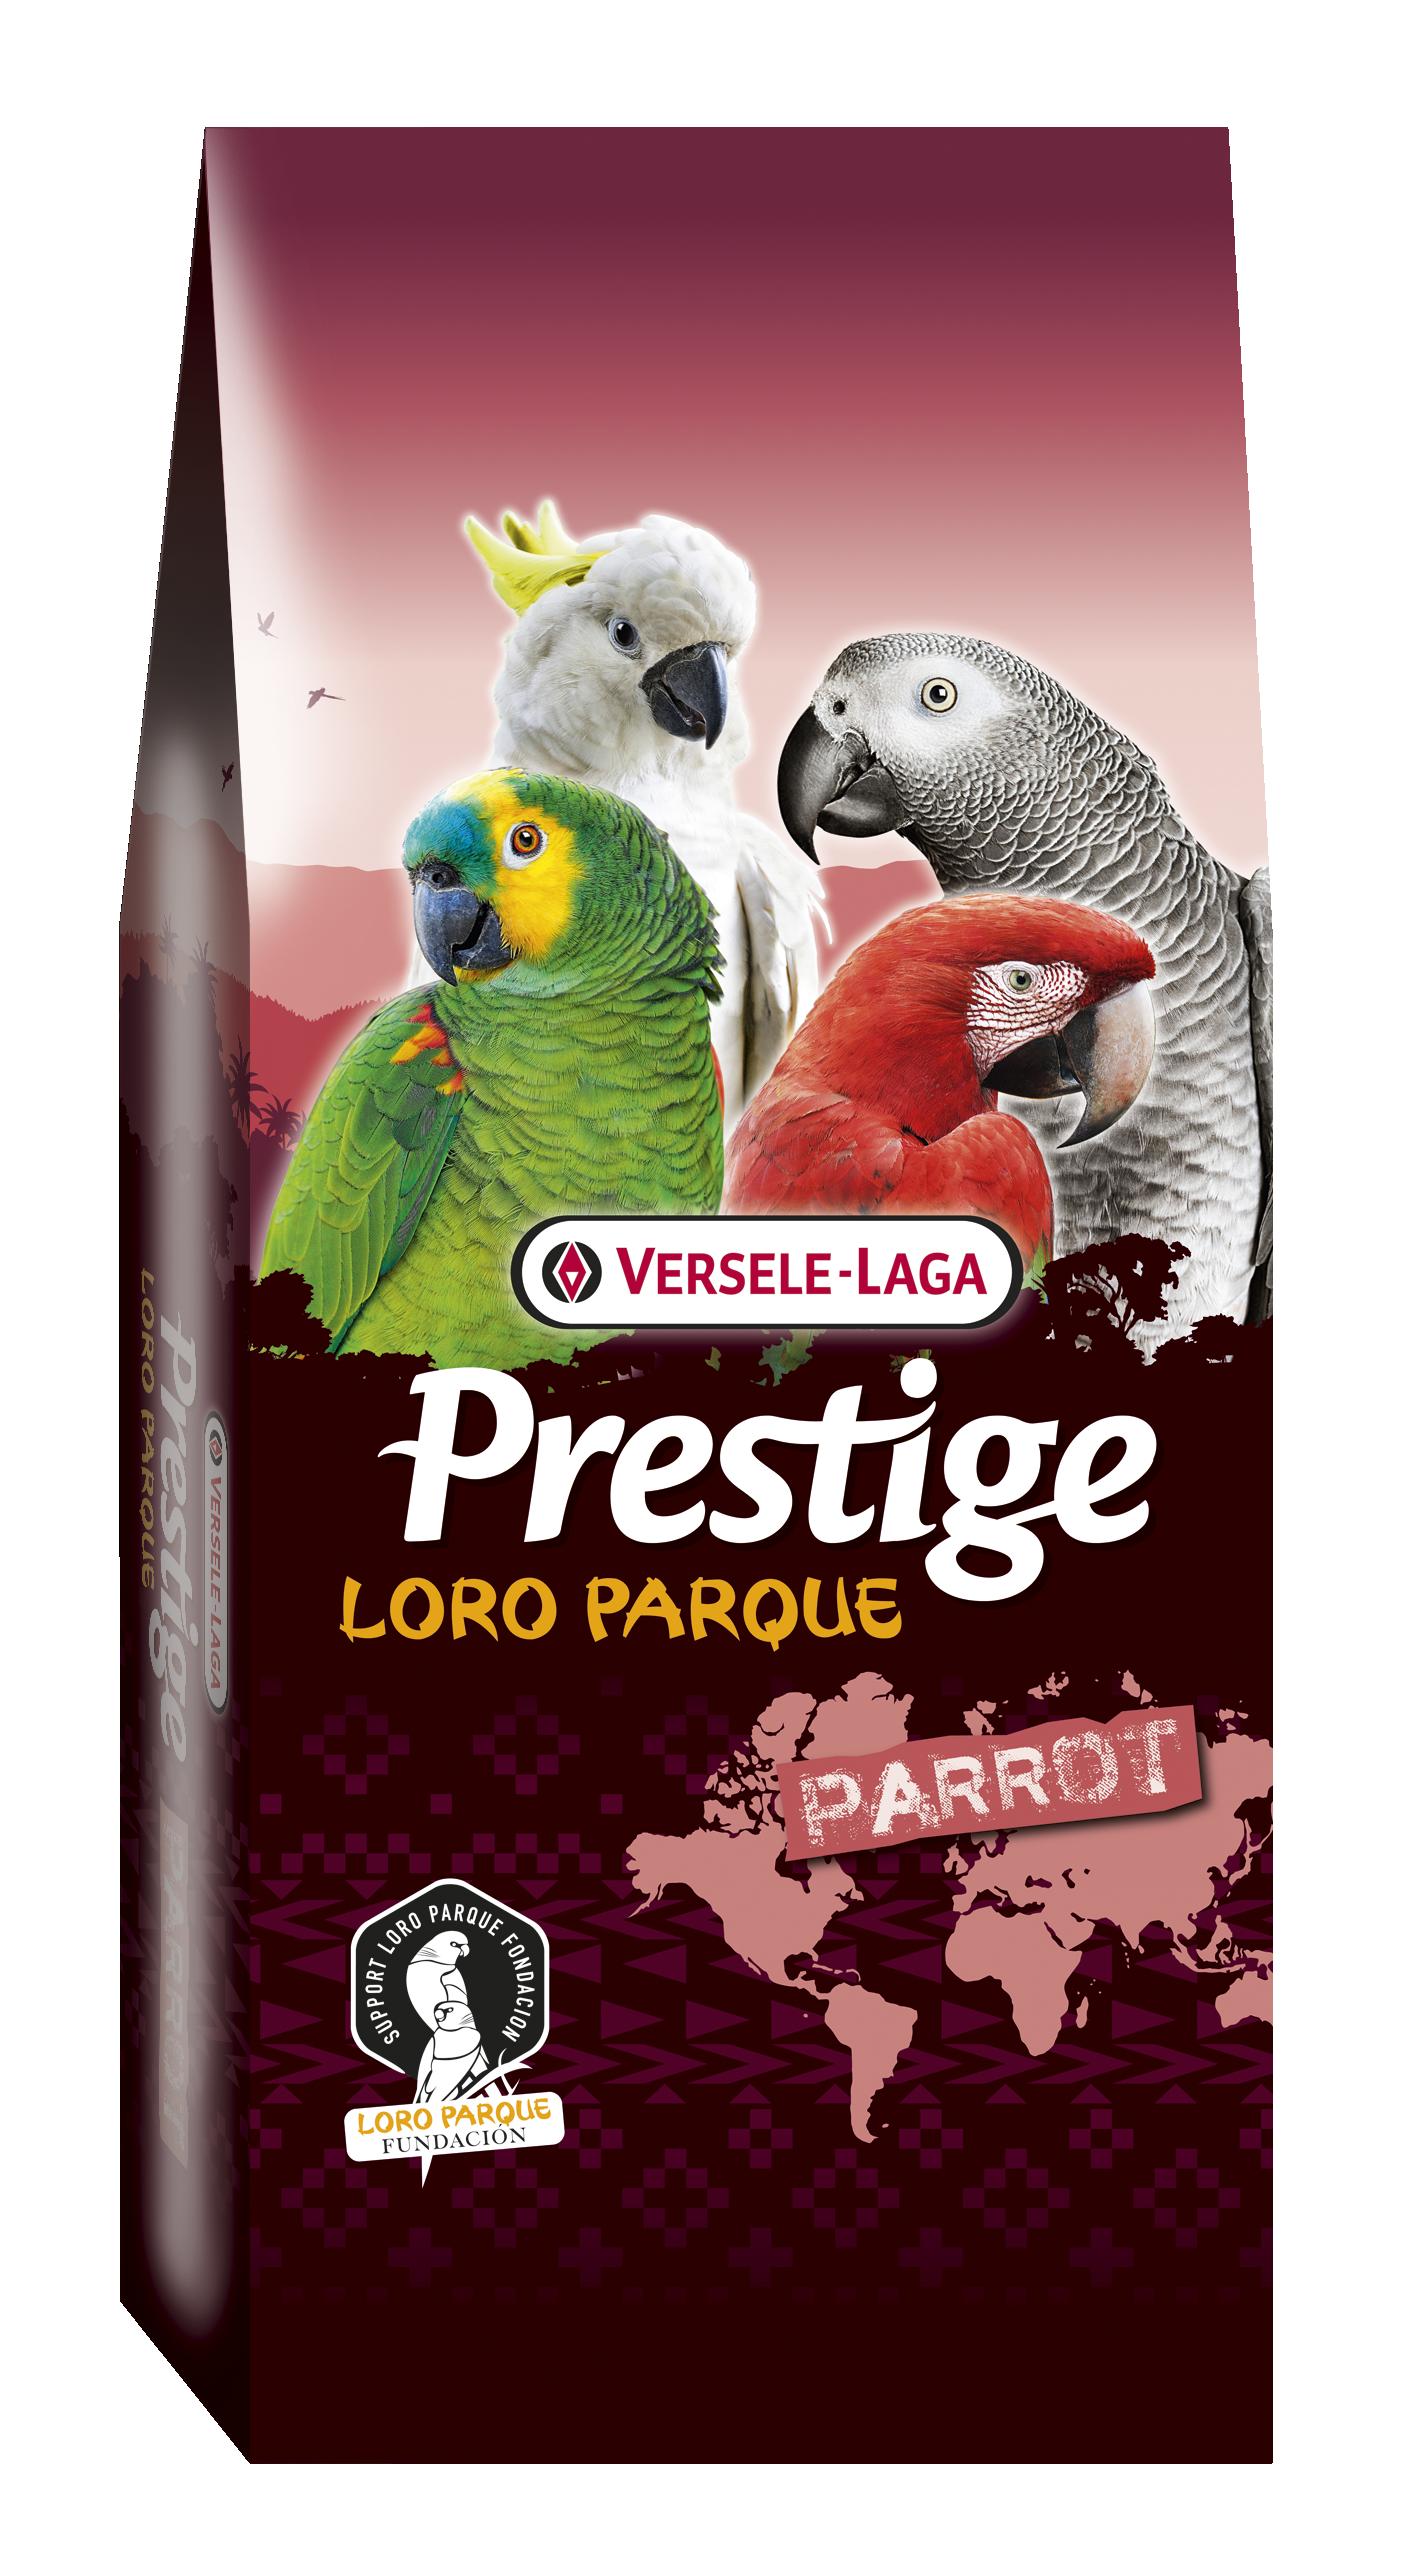 VERSELE-LAGA Australian Parrot Loro Parque Mix 15 kg